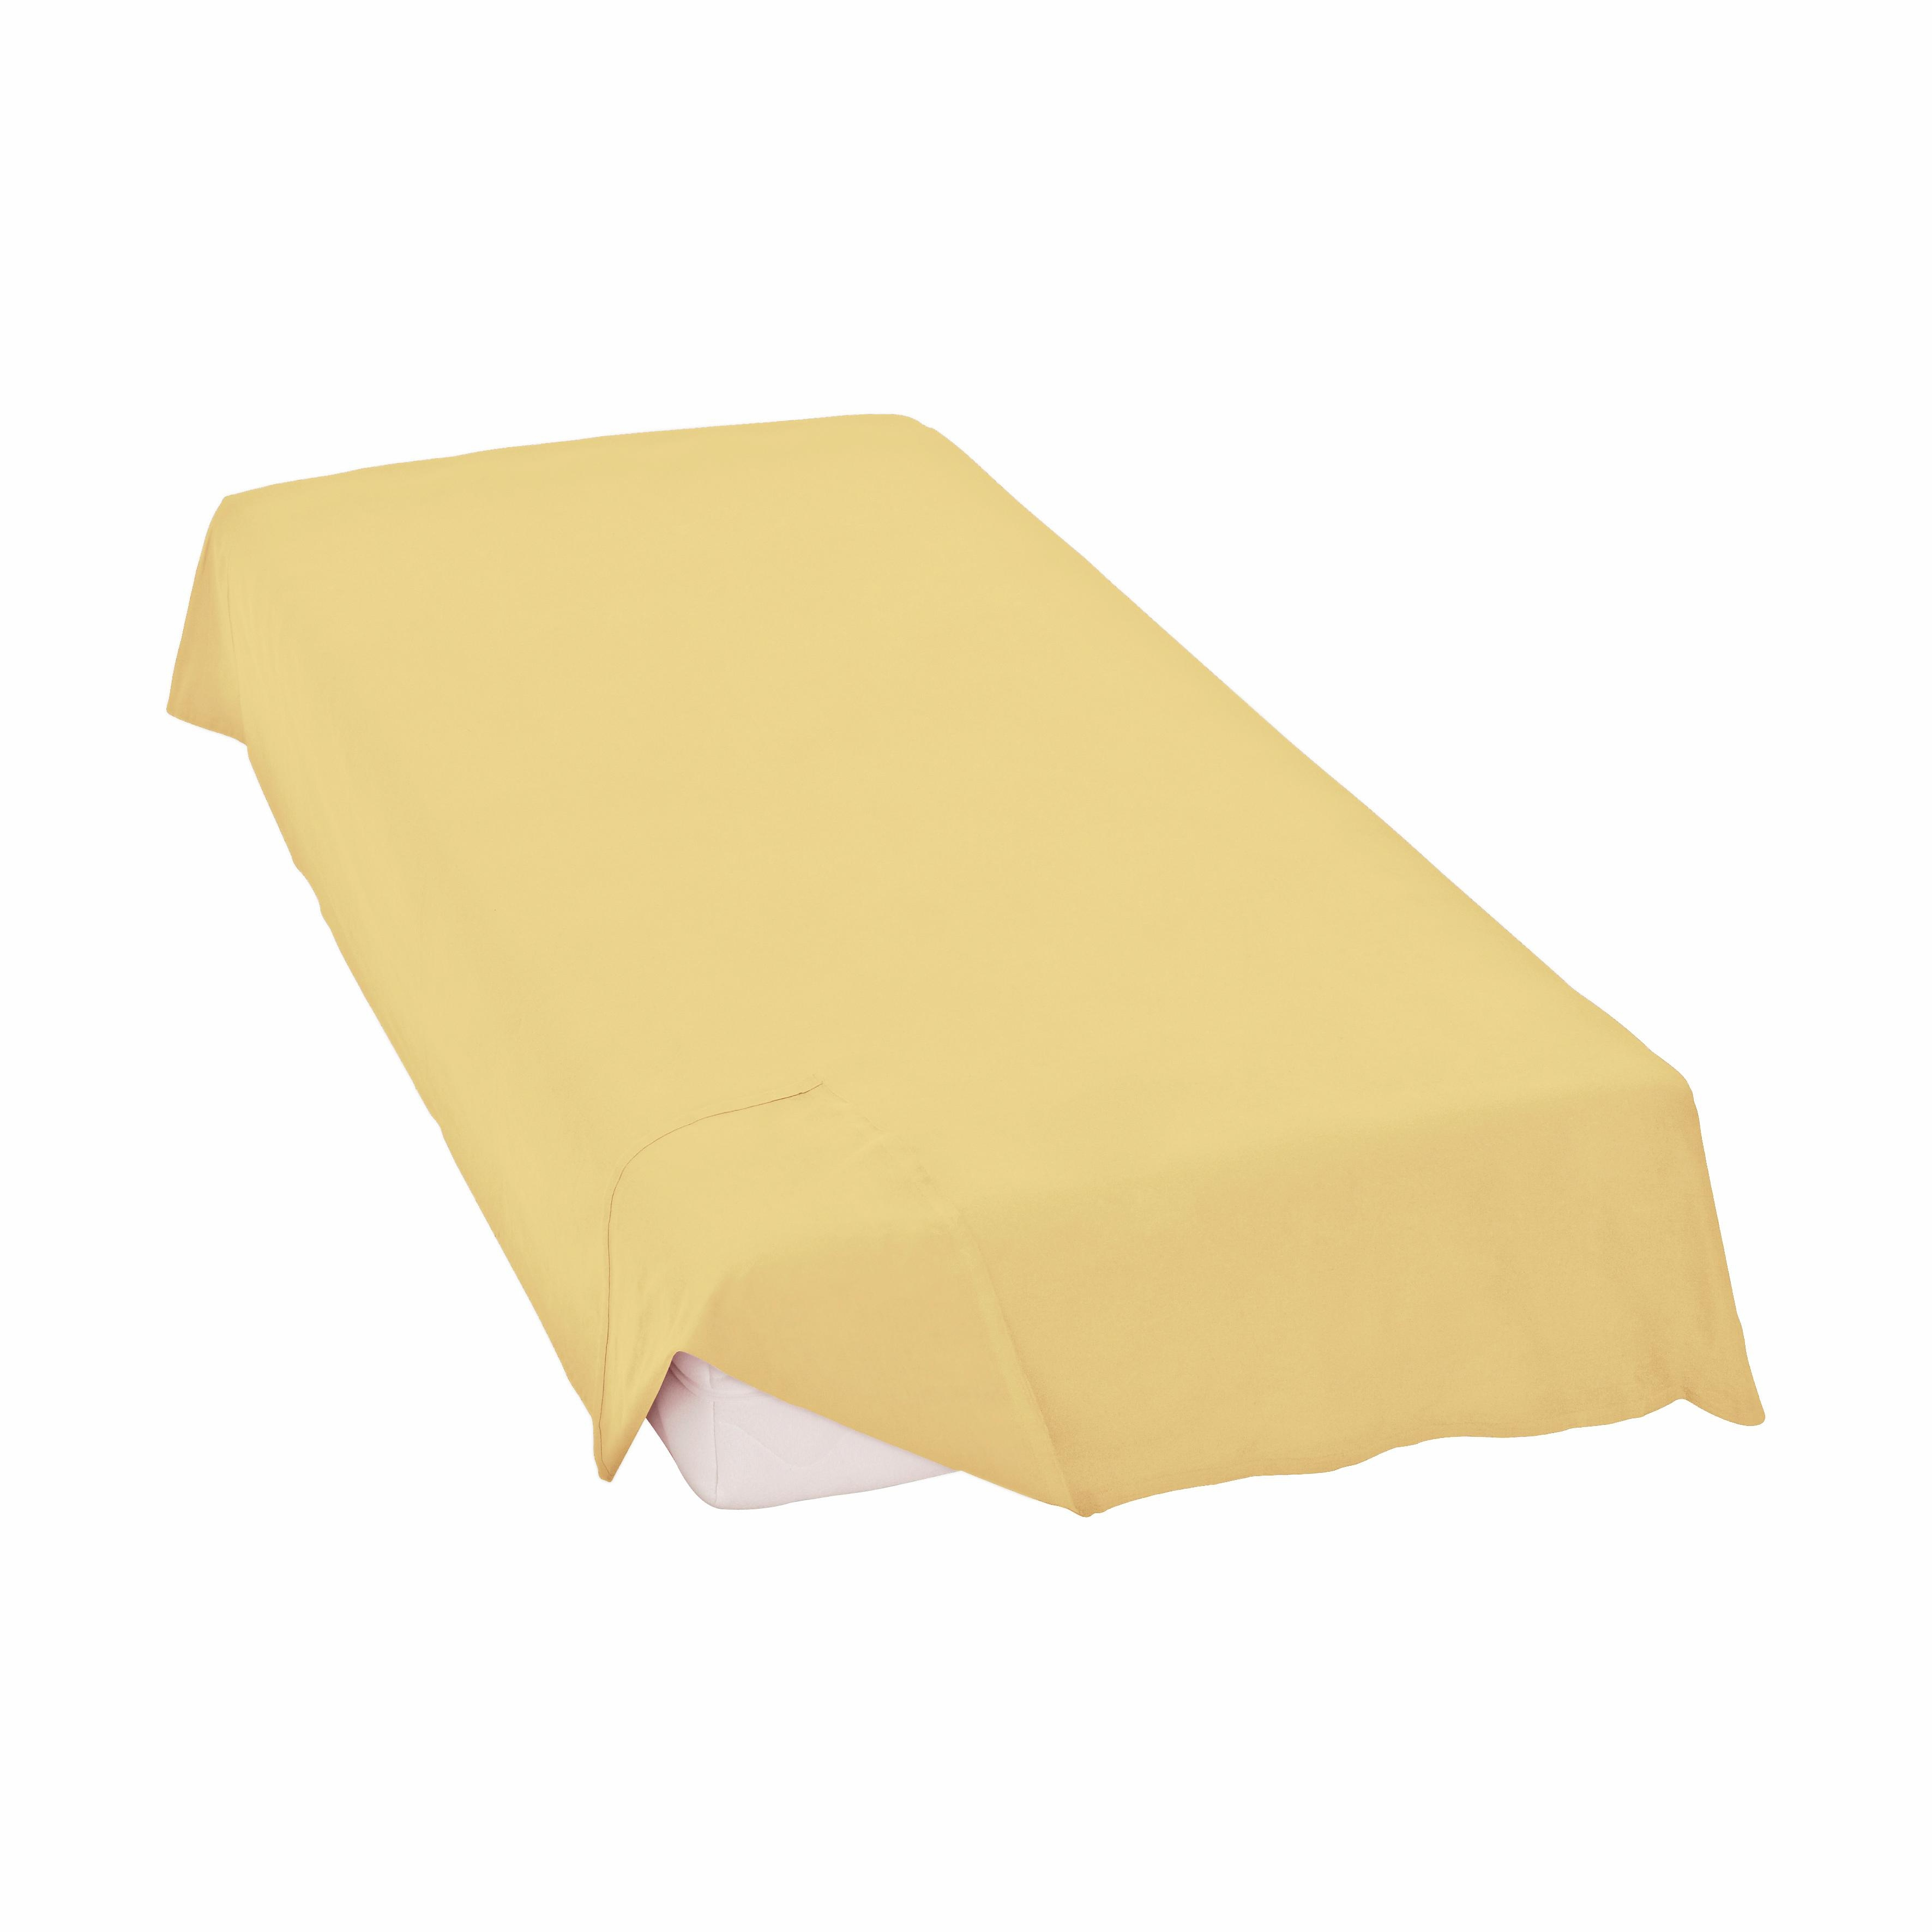 laken schlafgut linon laken zonder elastiek beige